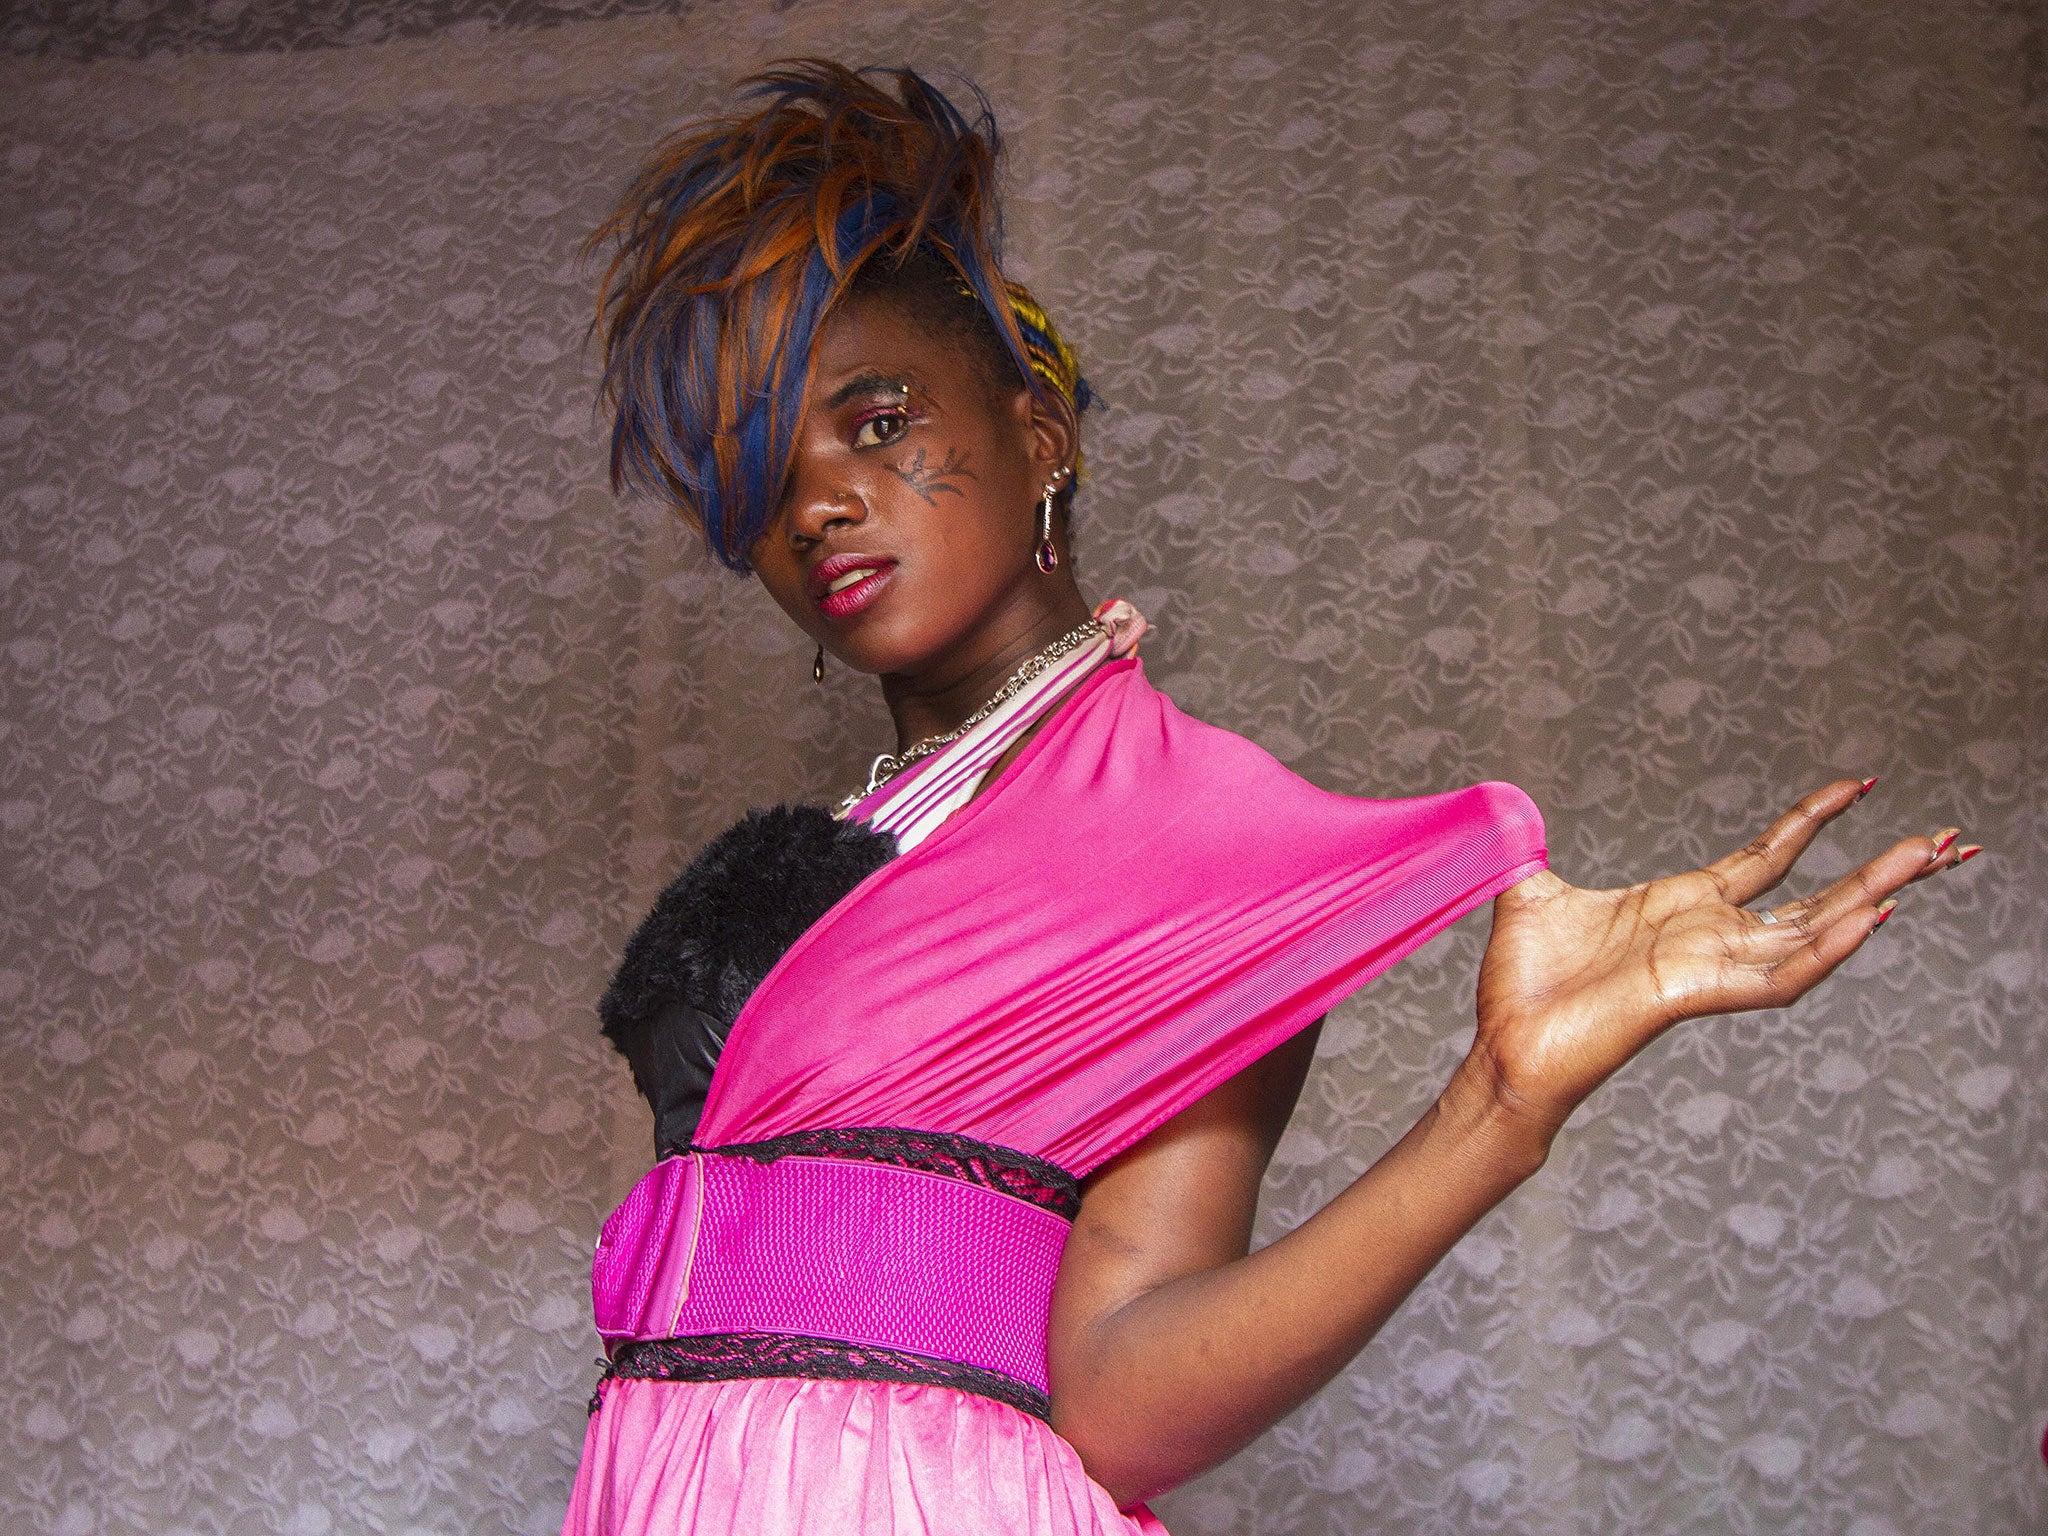 Ugandan pop star Jemimah Kansiime arrested and jailed for wearing short dress in music video